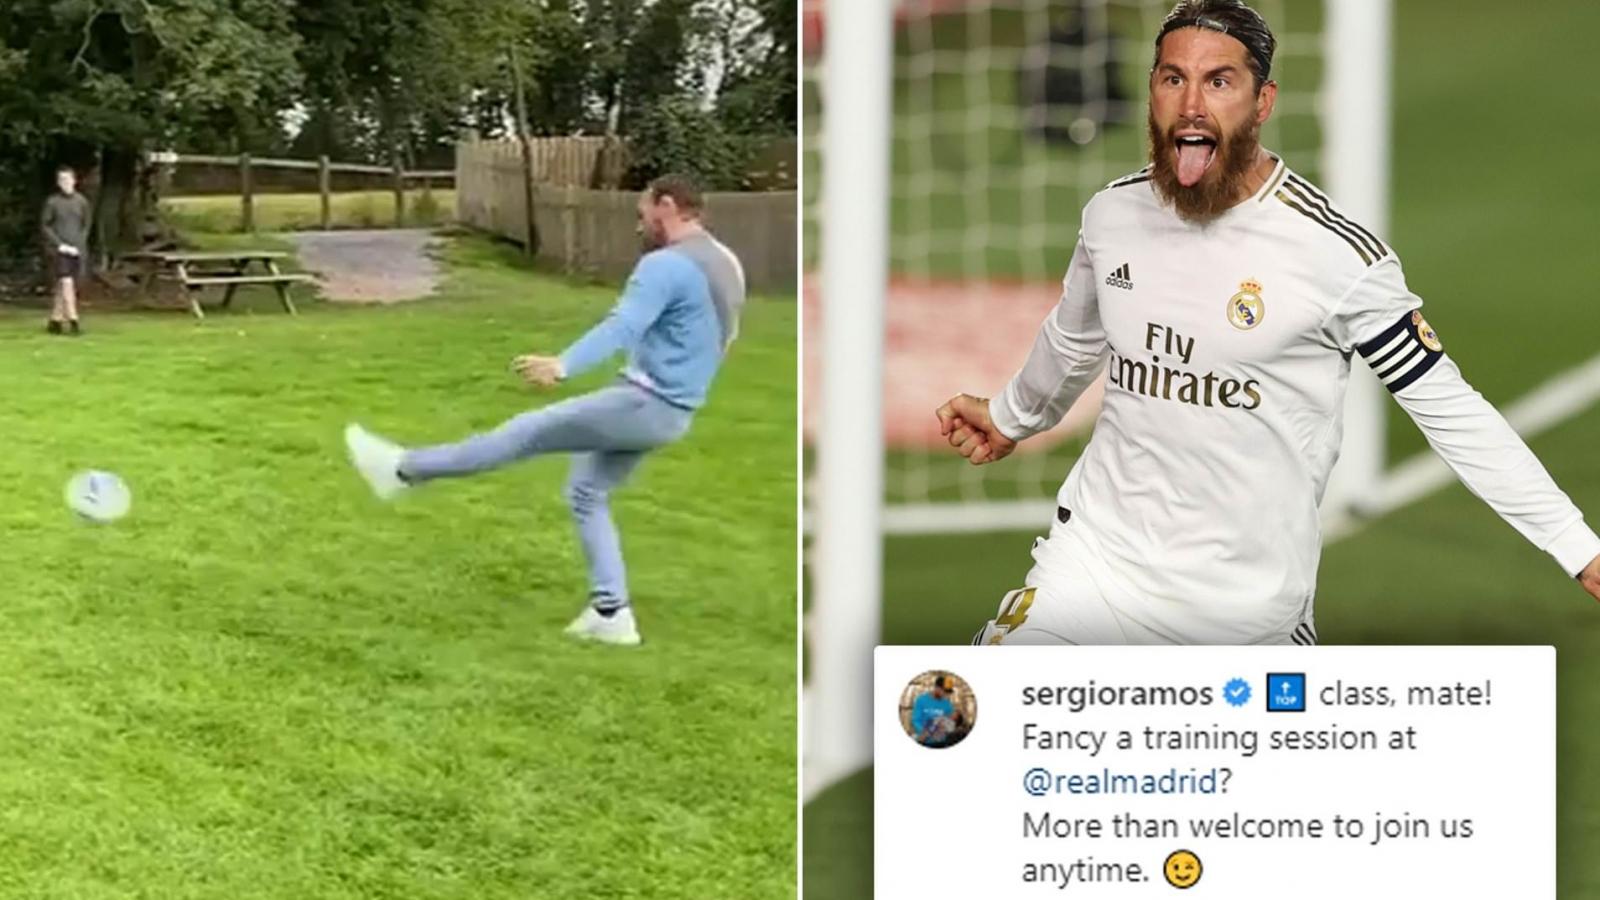 VIDEO: Conor McGregor trổ tài ghi bàn, gửi lời thách thức Sergio Ramos